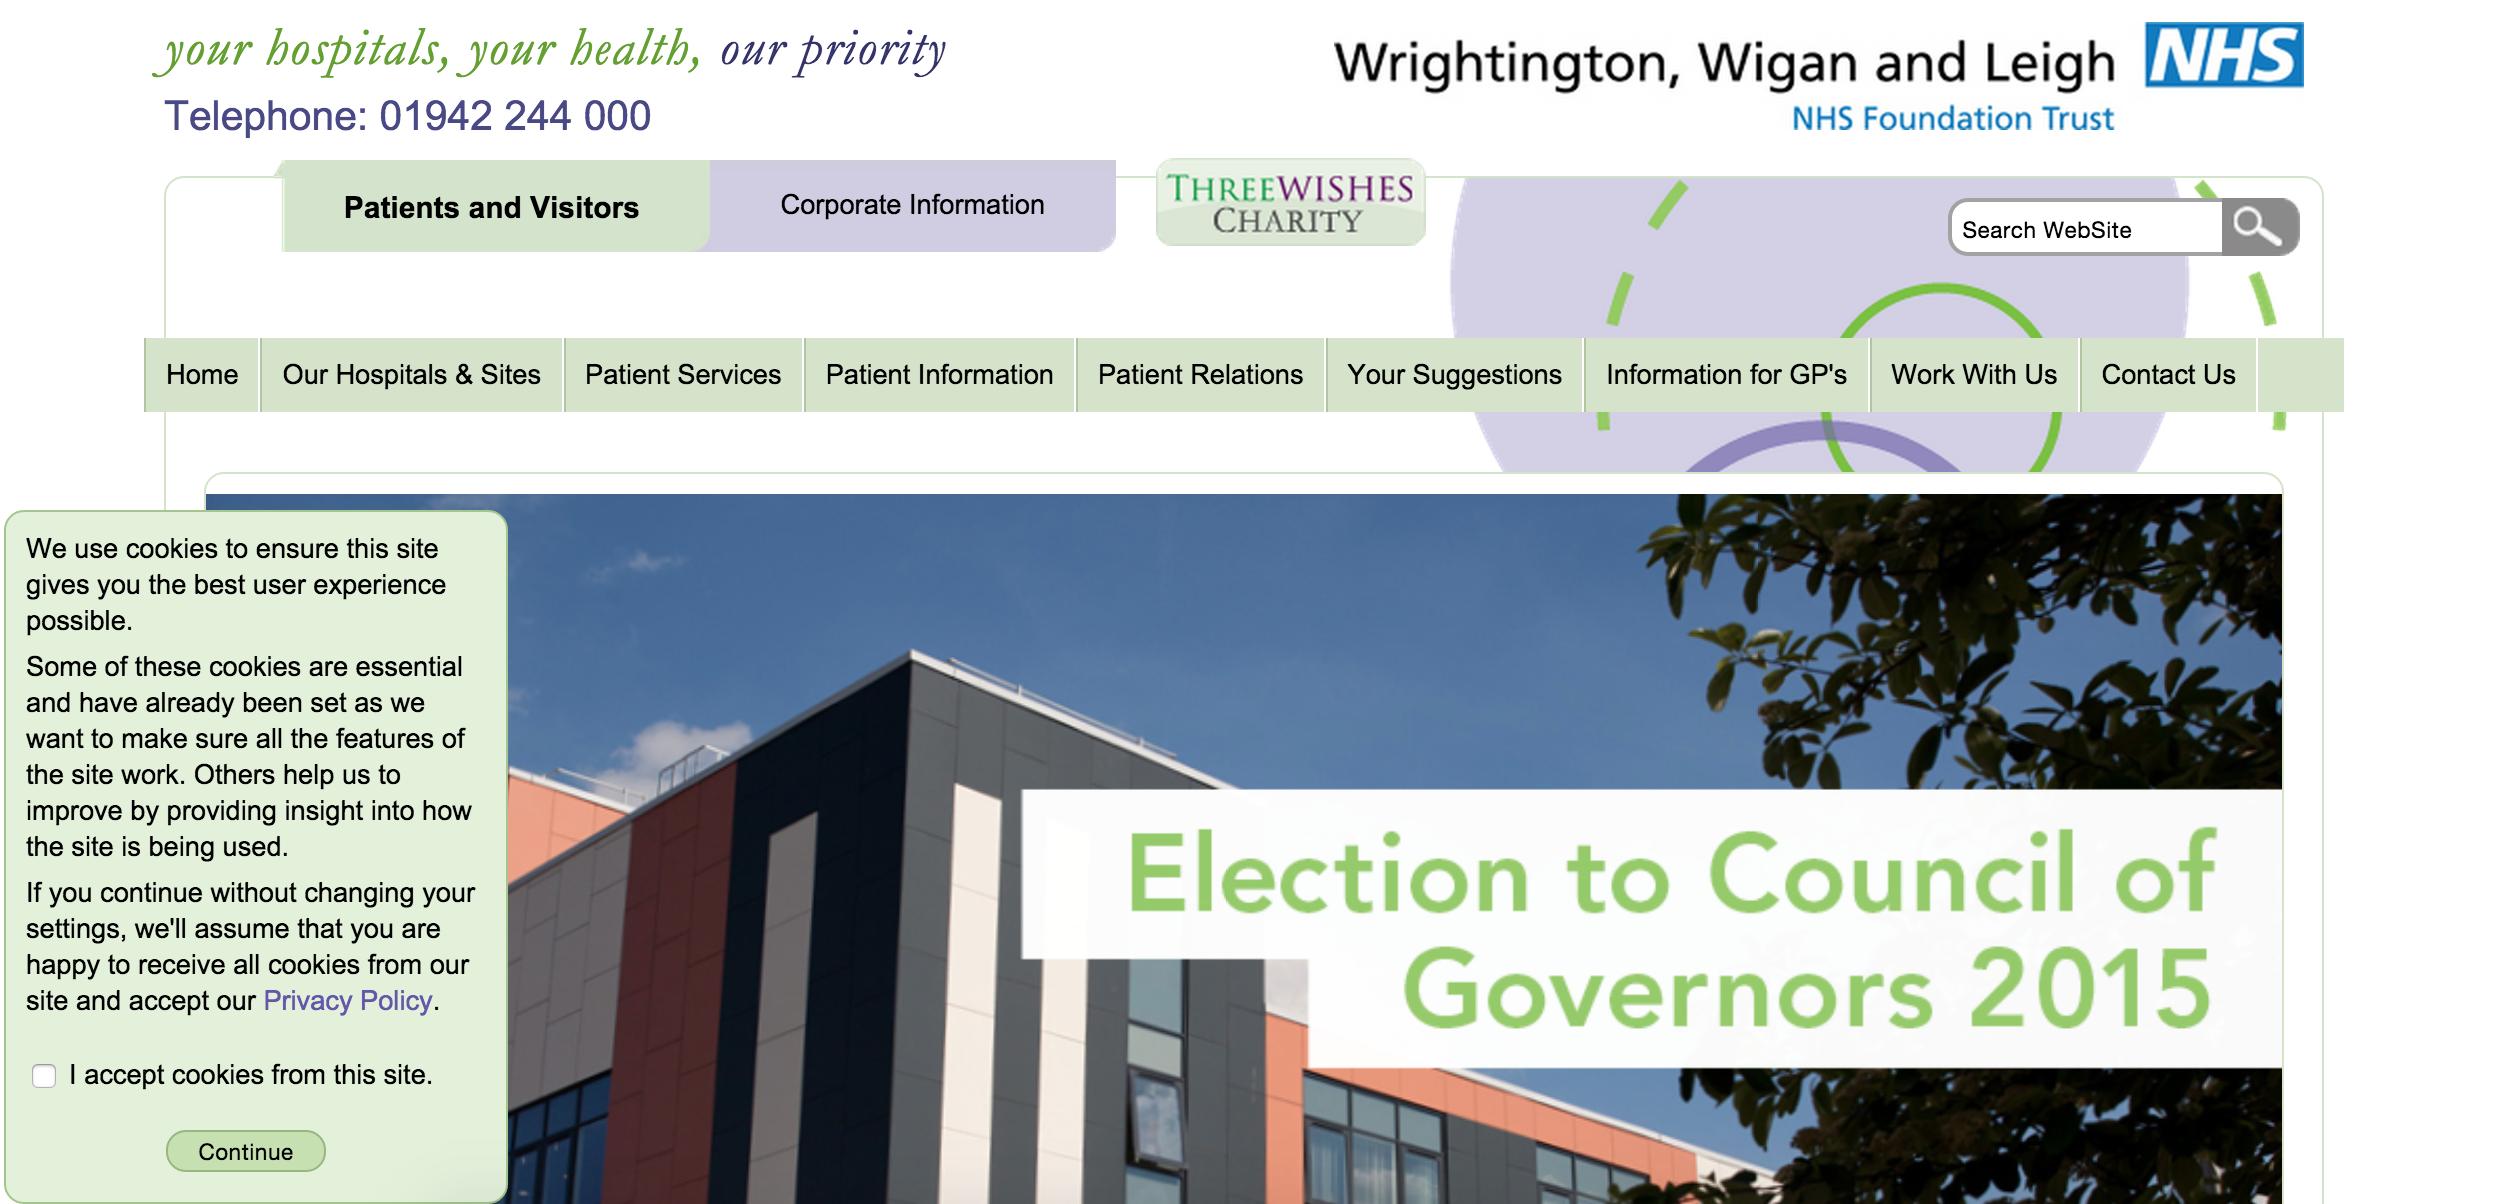 Wrightington, Wigan & Leigh